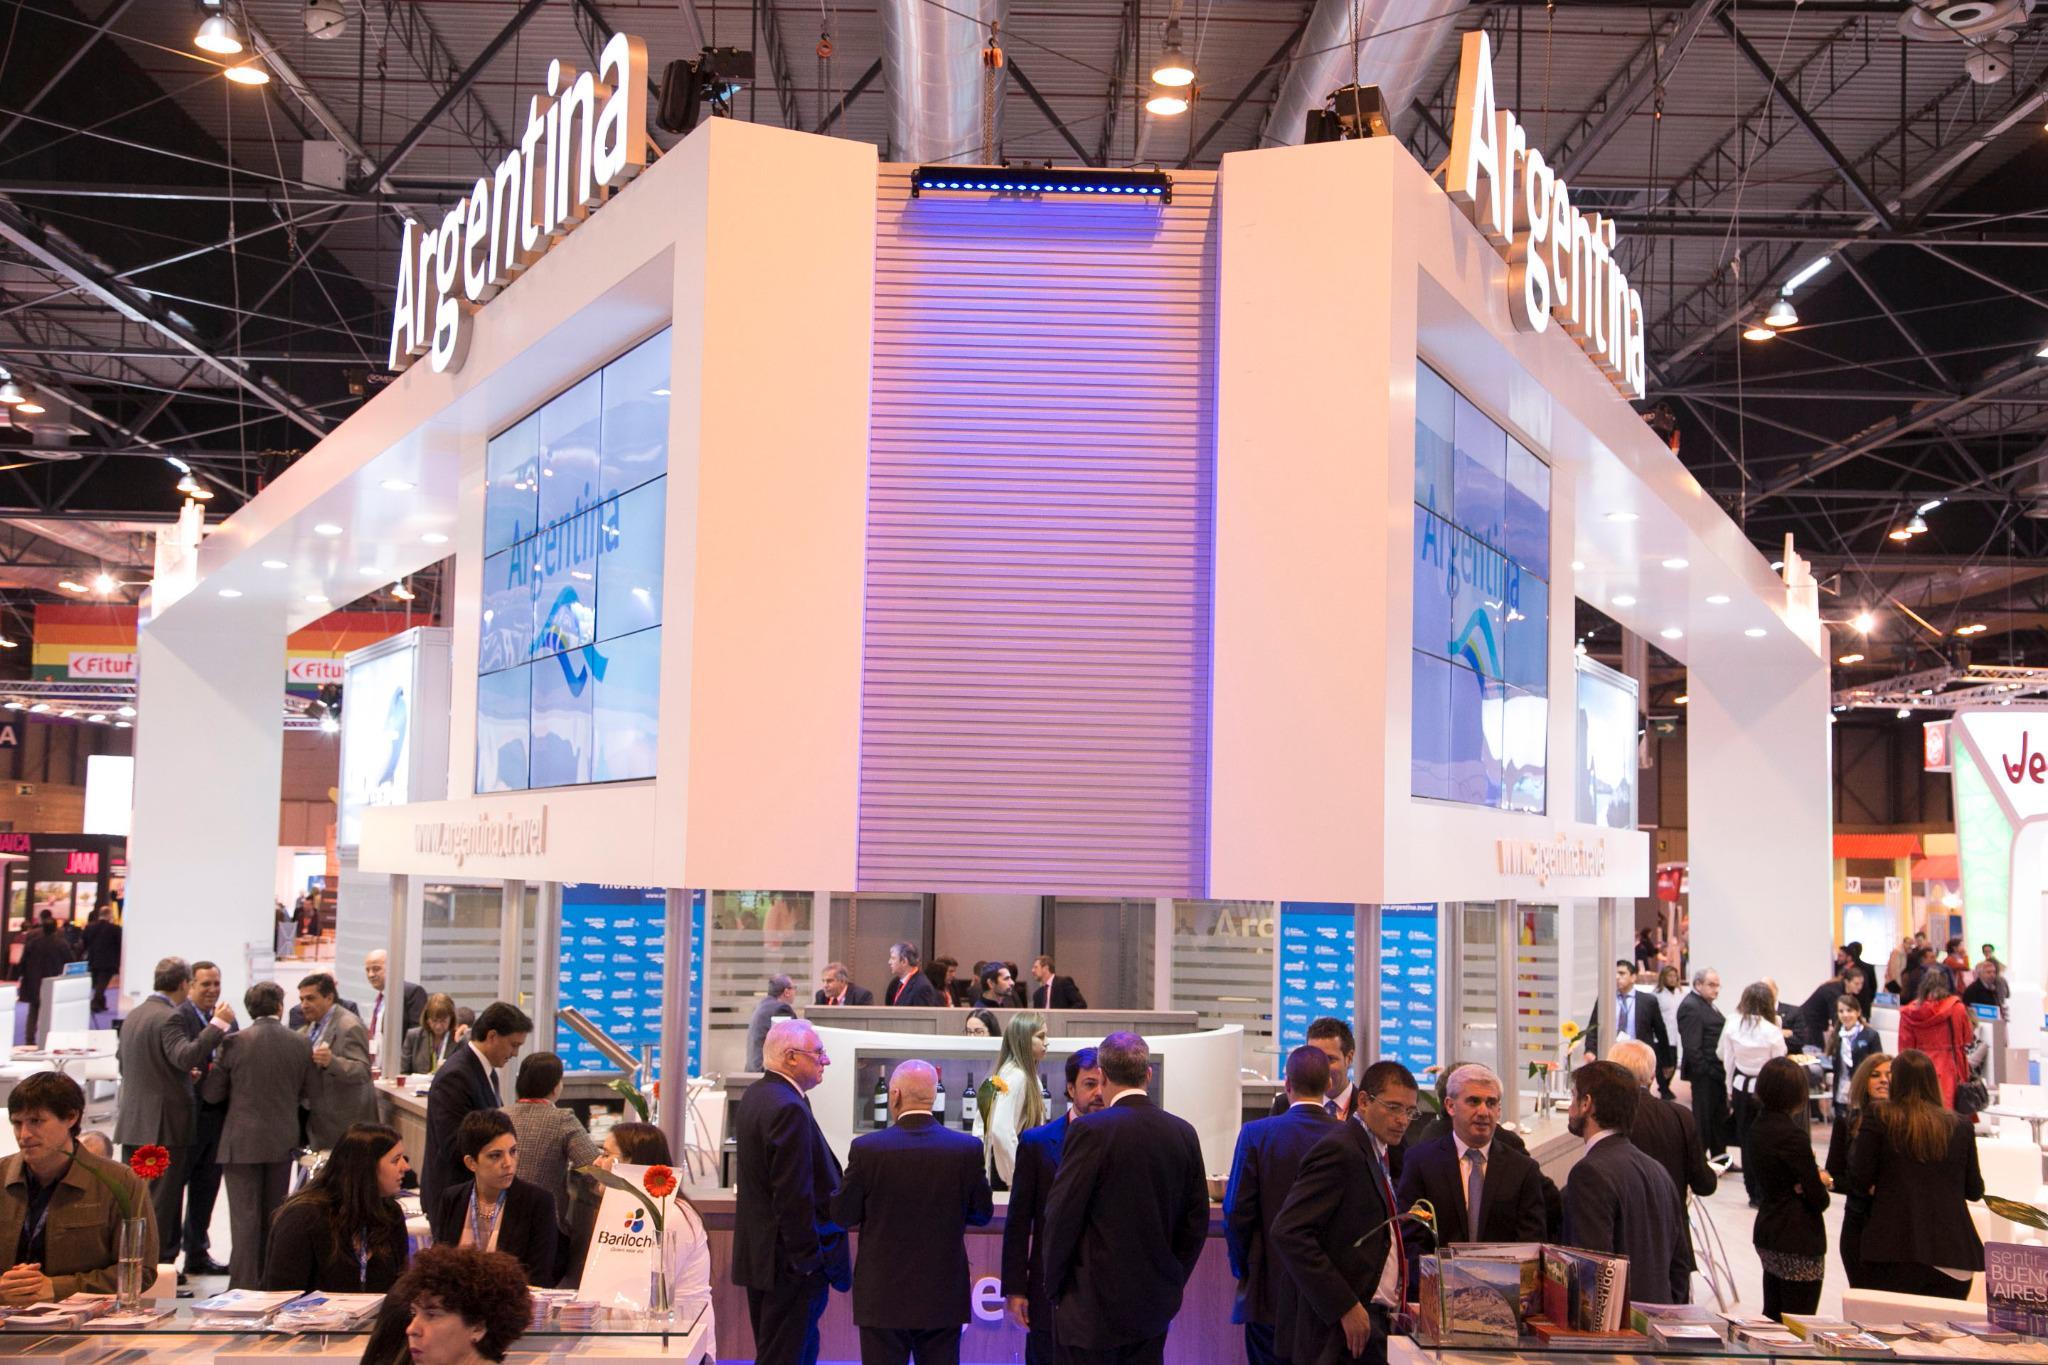 RT @InproturArg: Más imágenes de la presencia Argentina en #FITUR2015 @compartiendotur @minturprensa @mensajeronline @ReportEnLinea http://t.co/2ryrBZjQy3